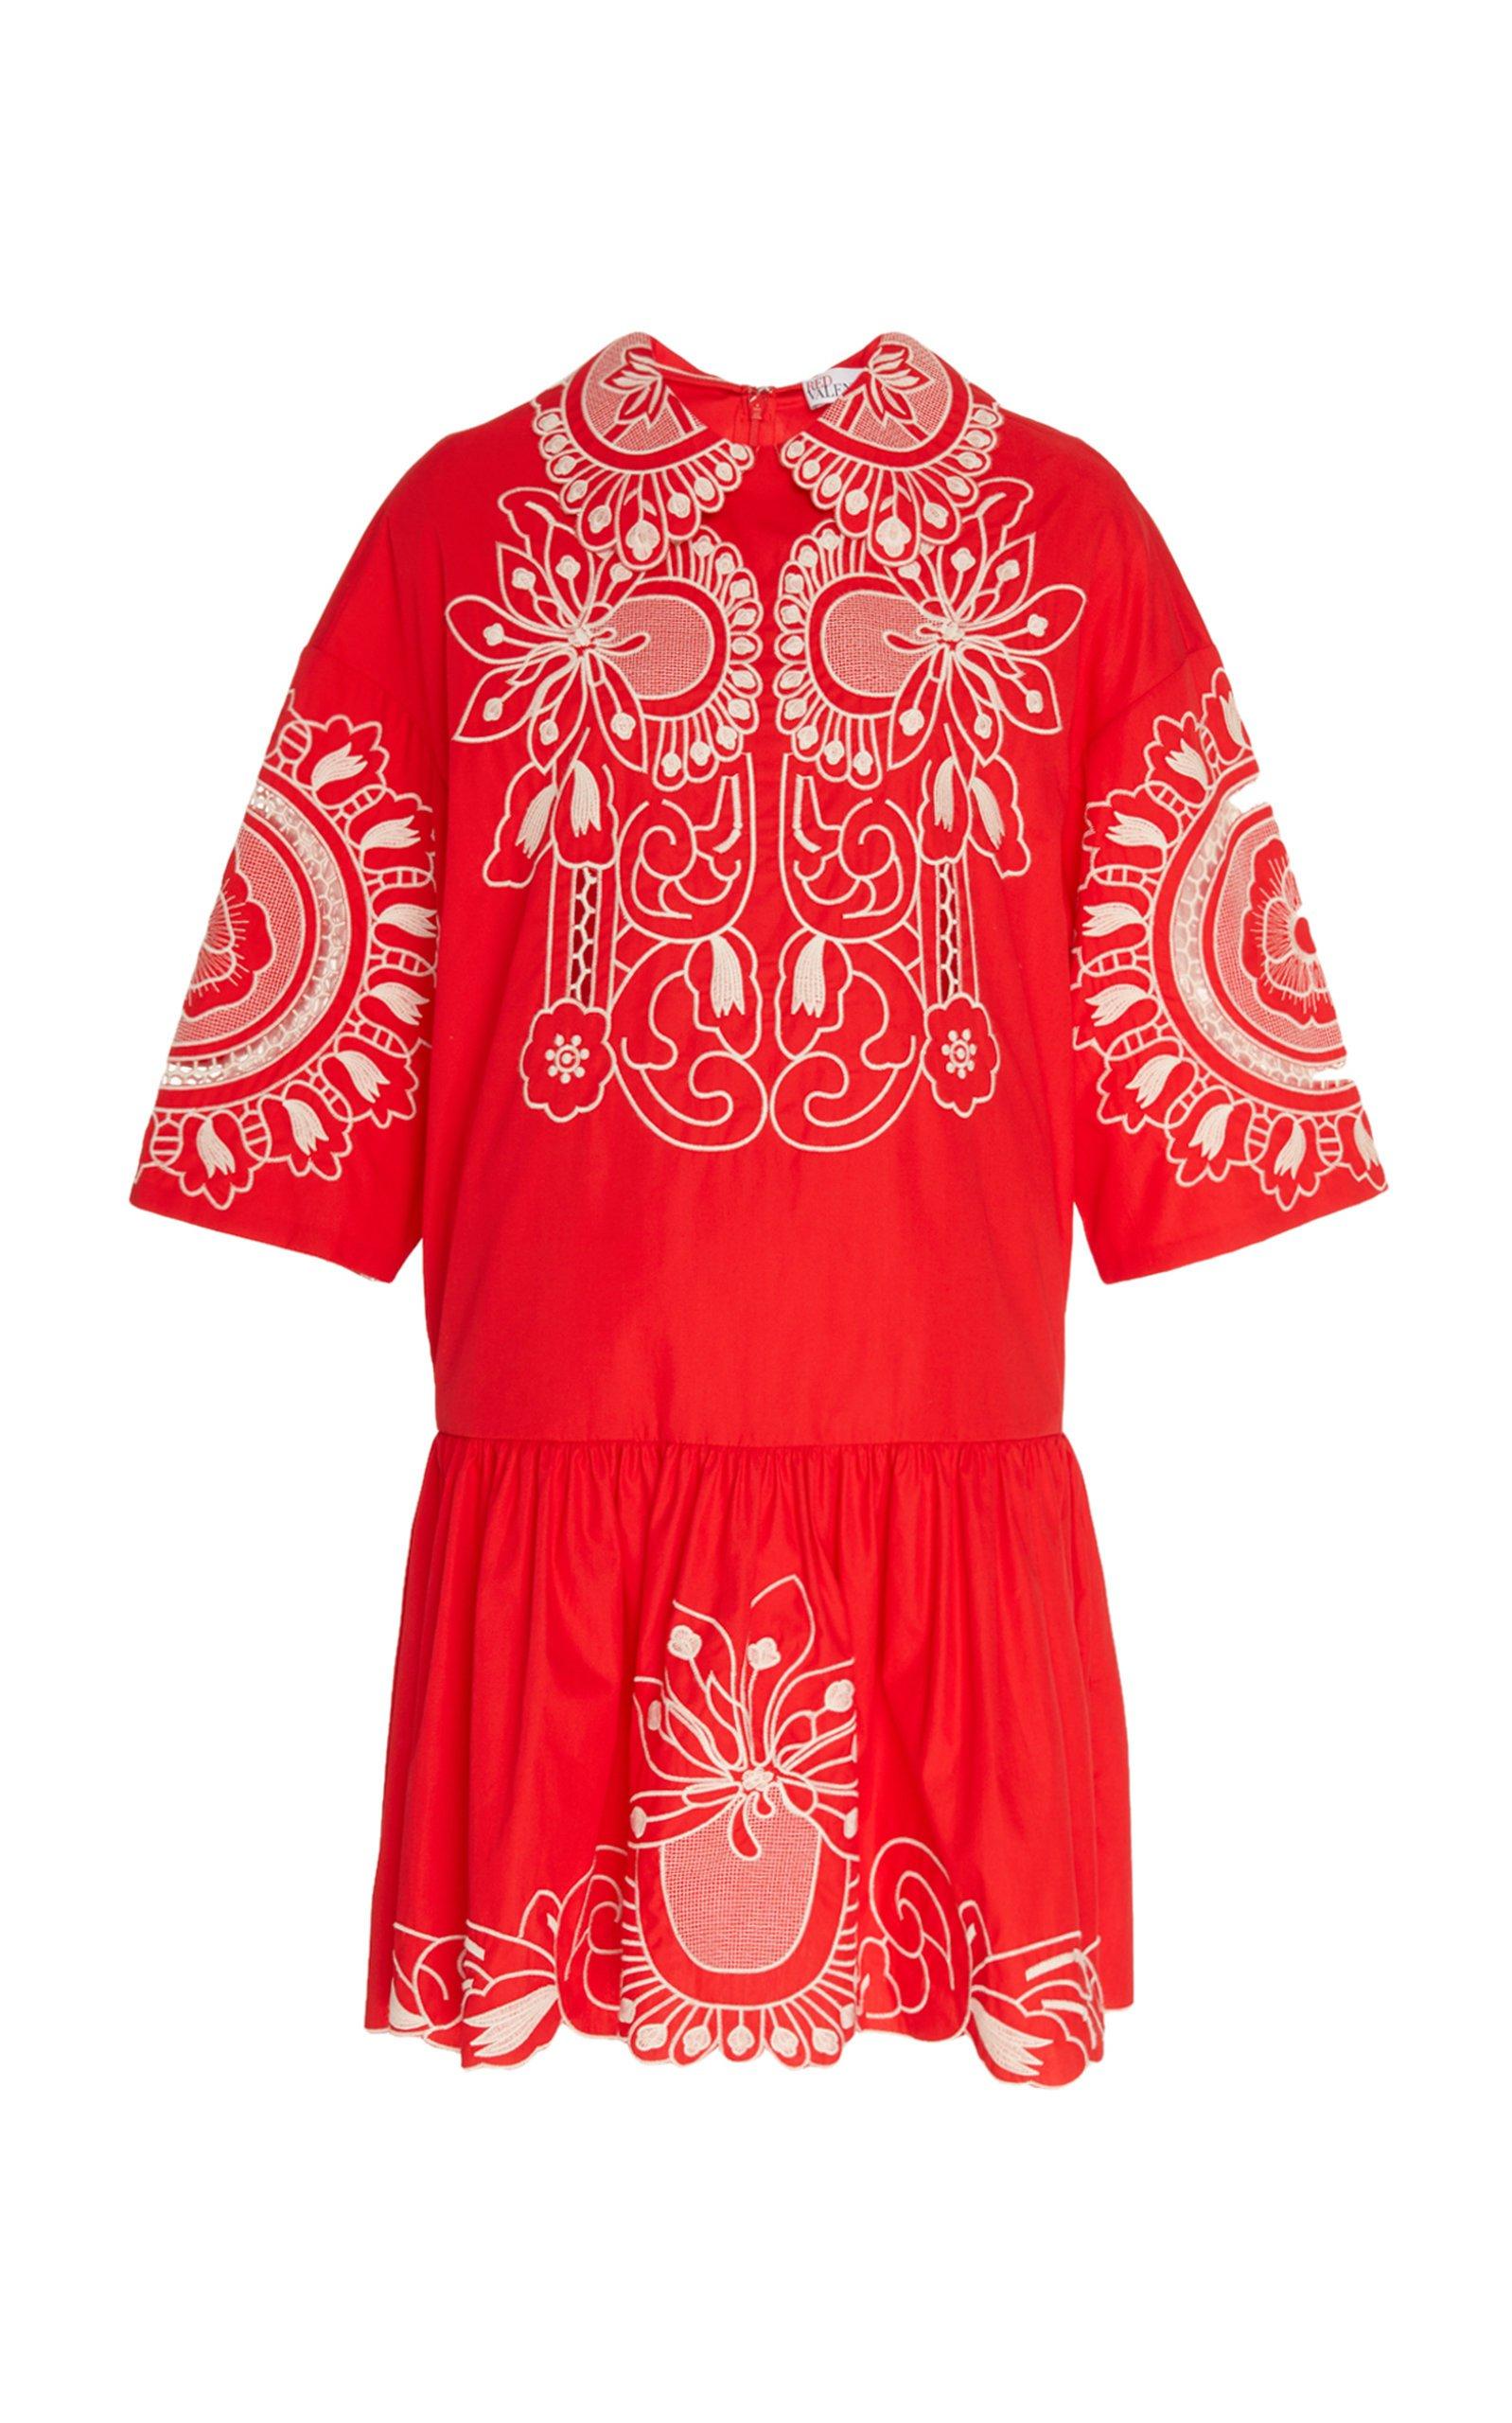 Red Valentino Embroidered Poplin Dress Size: 36